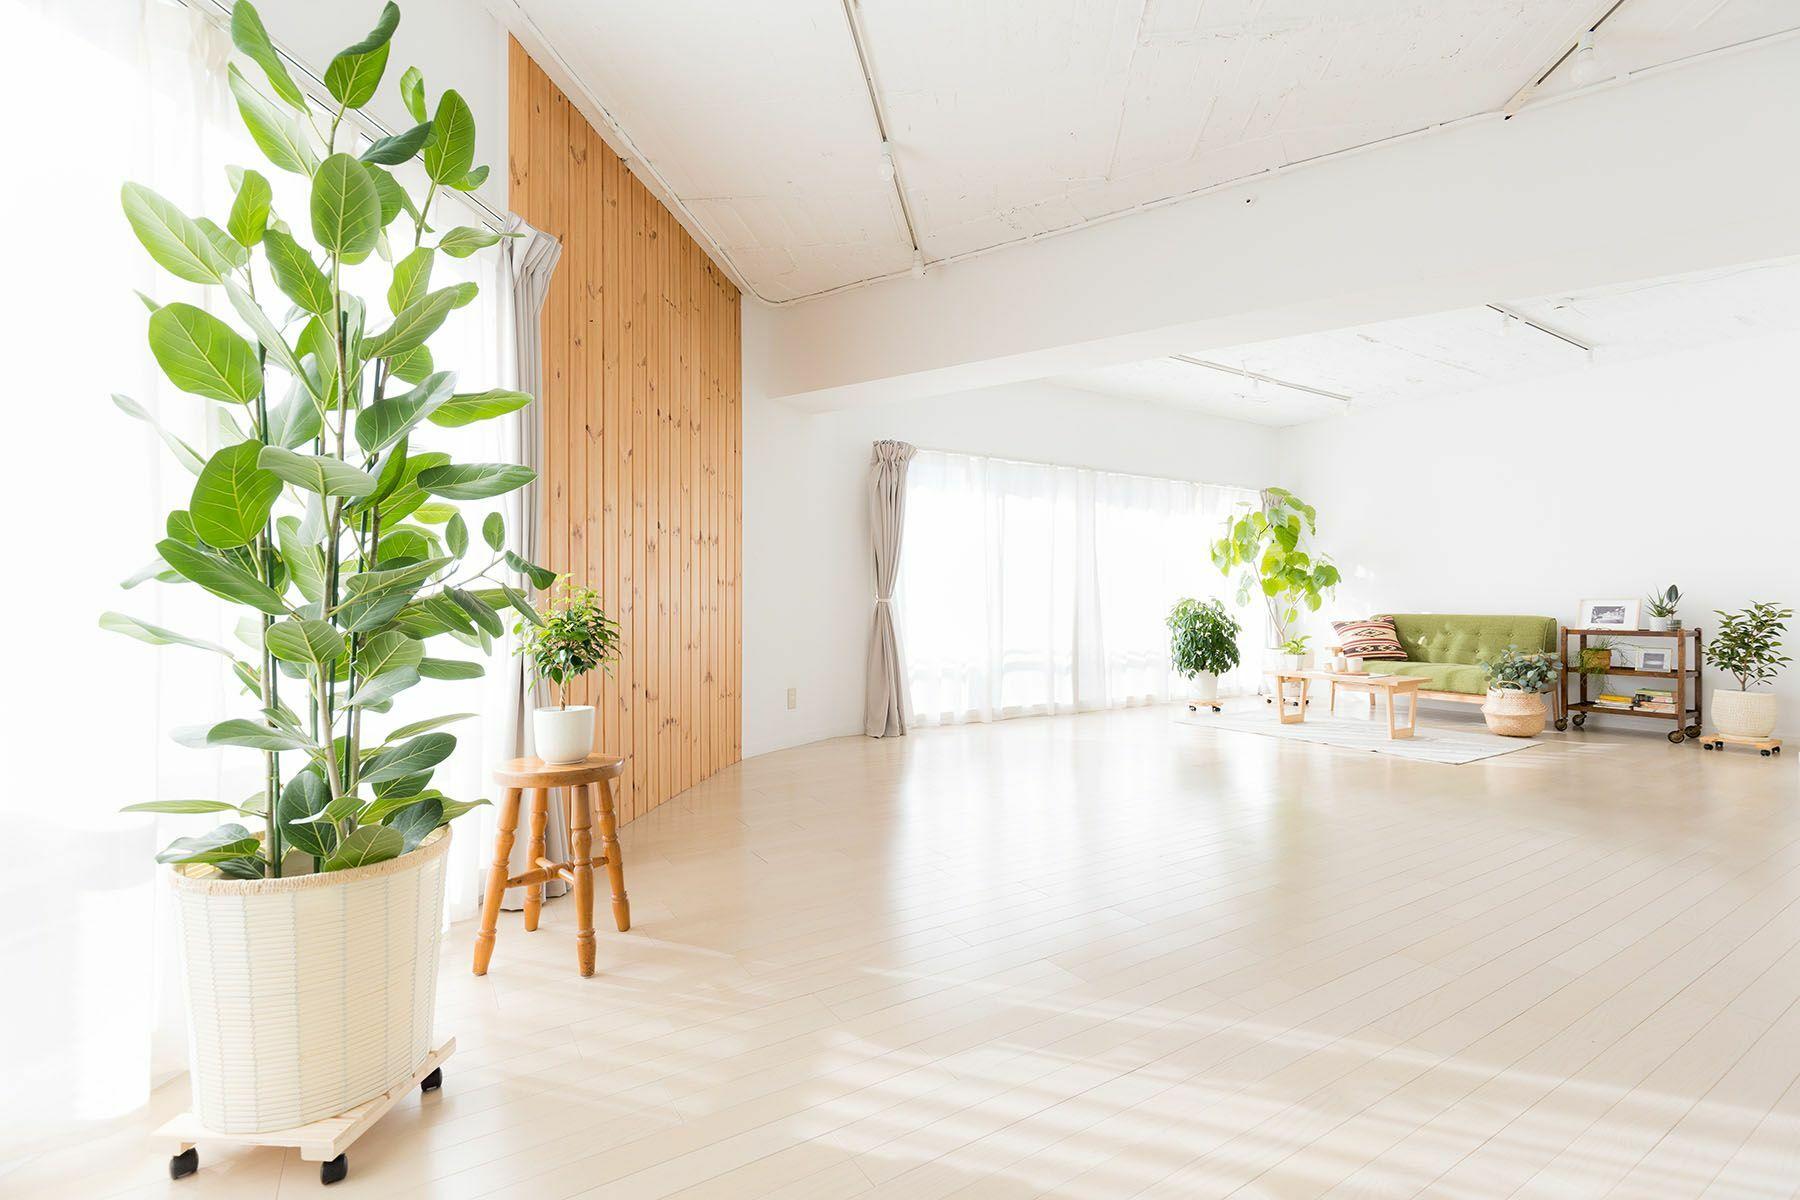 Studio Serato 代々木 (スタジオセラート代々木)使いやすい白壁と木目の床